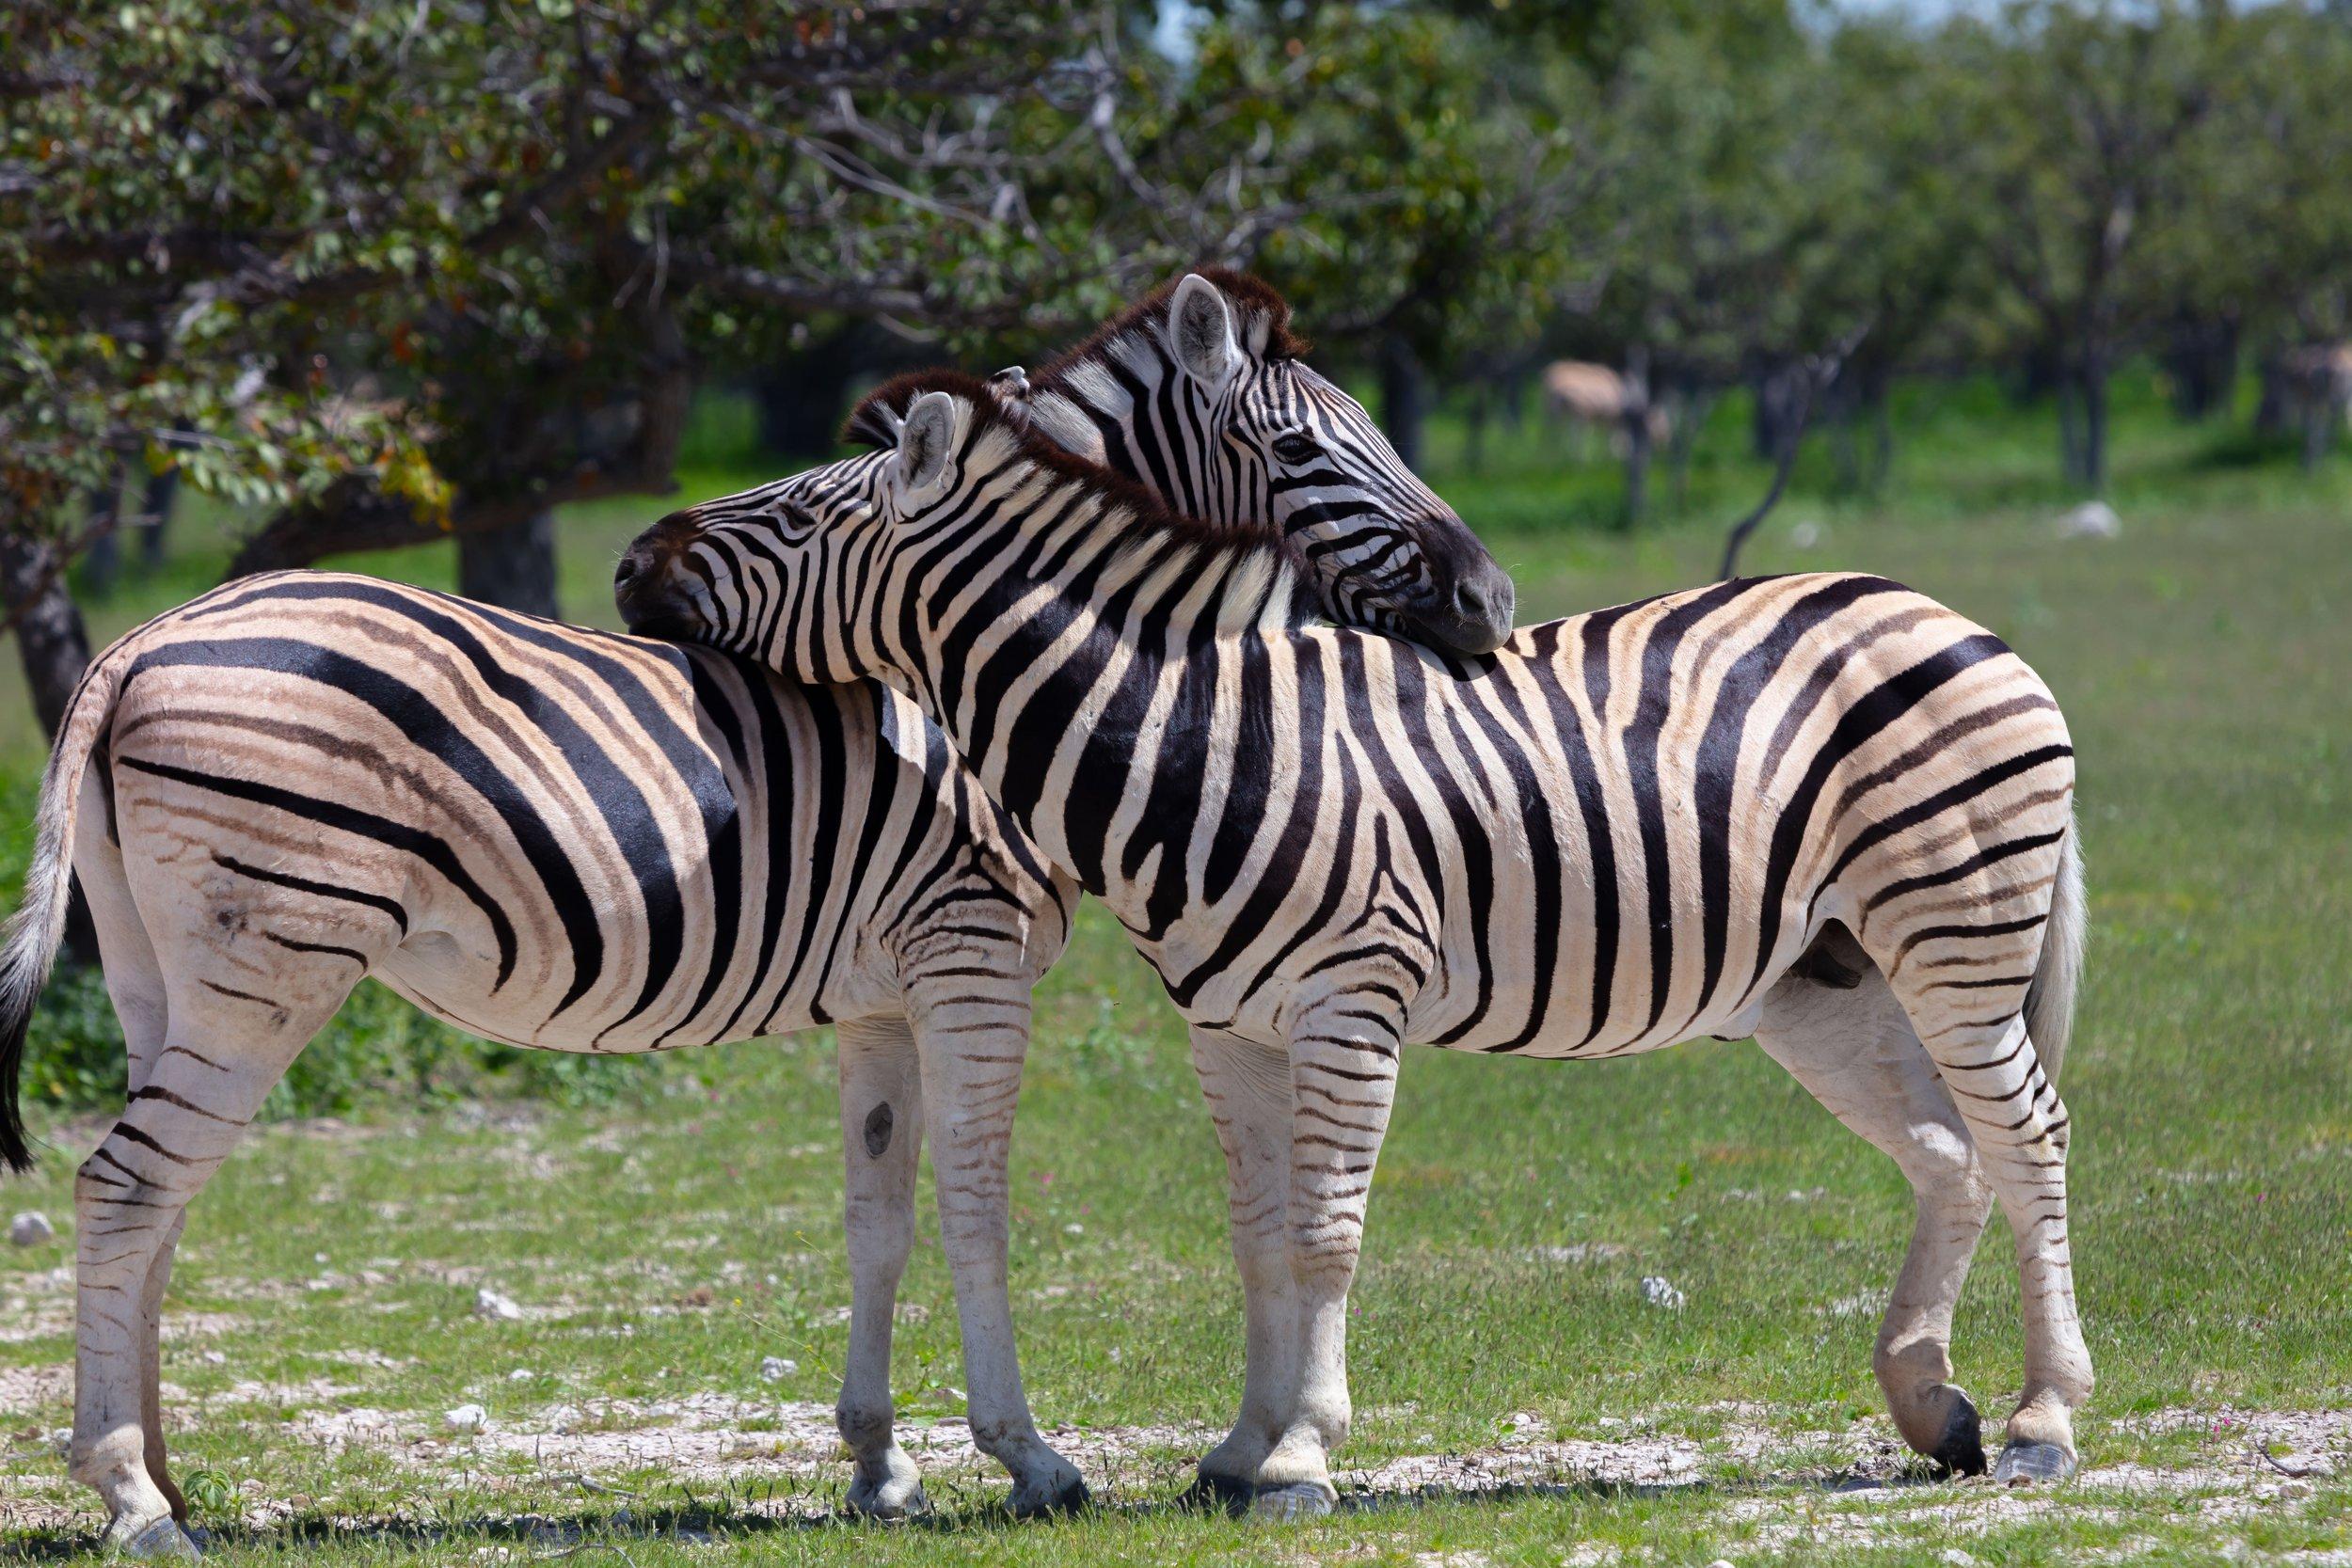 zebrashugging.jpg